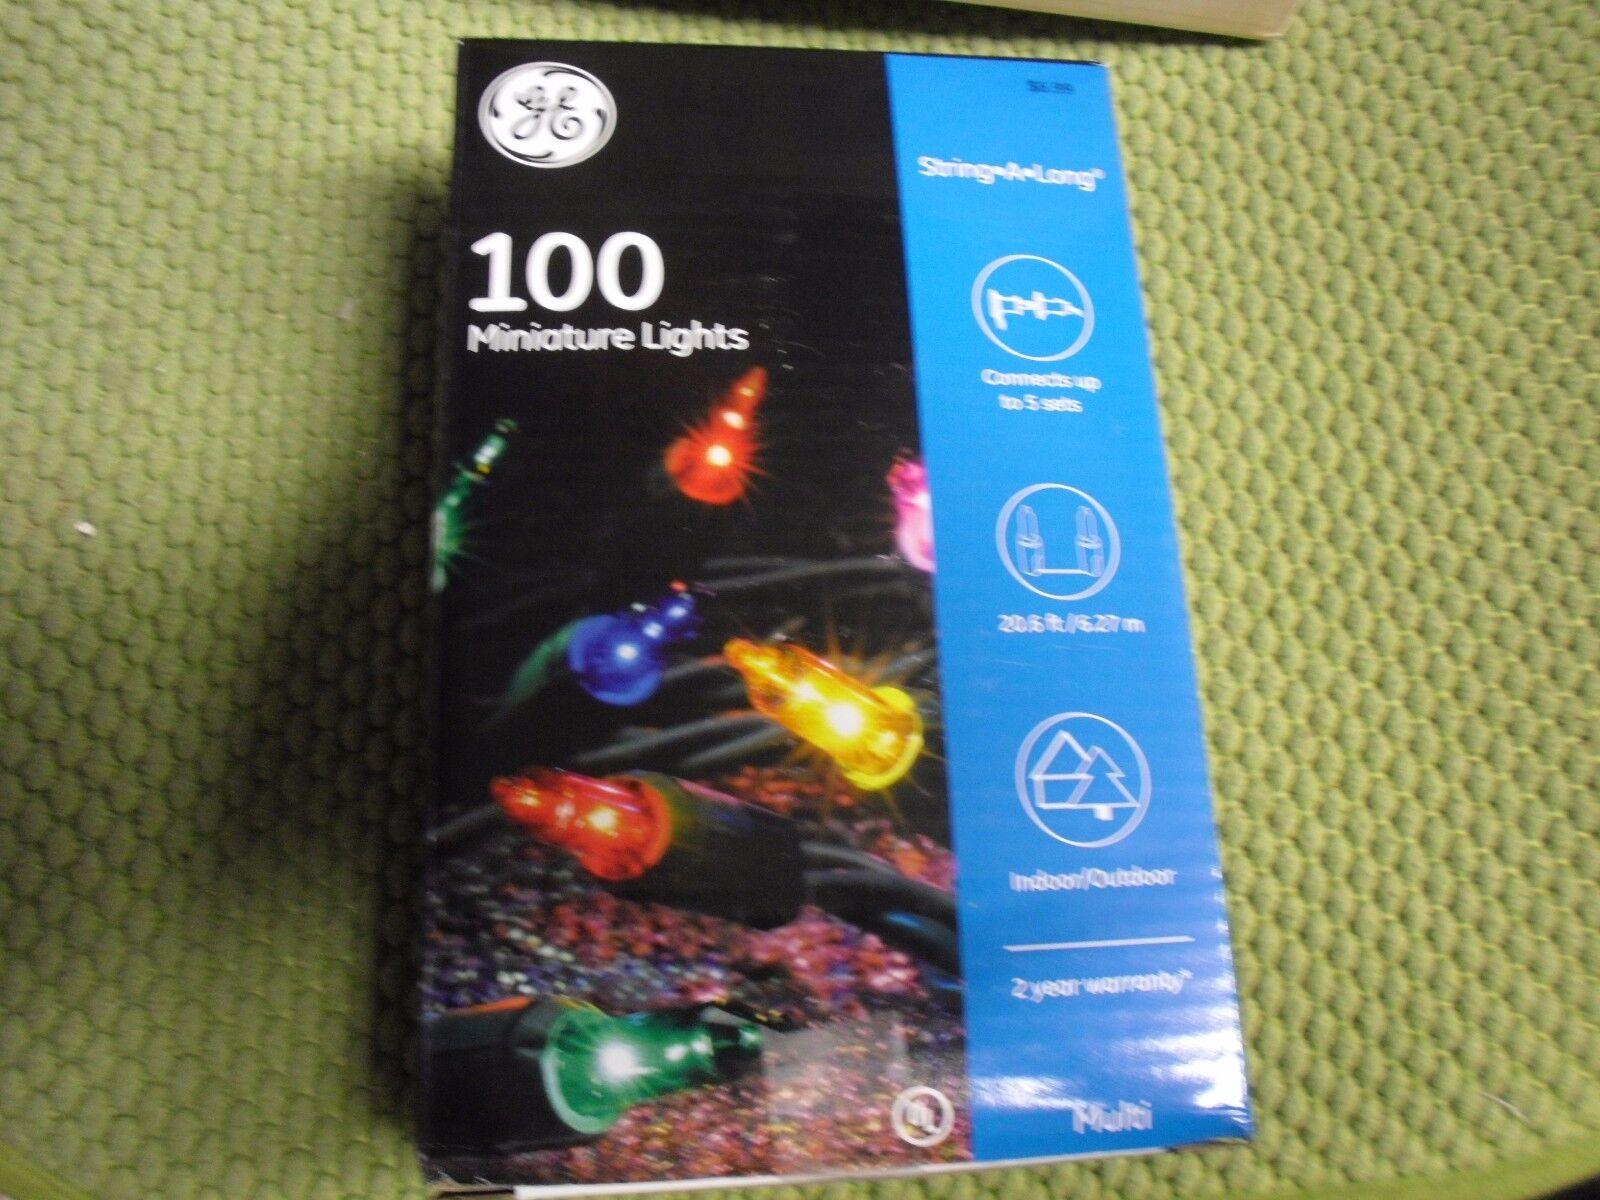 GE miniature lights String-A-Long 100-Light Green Wire Multi